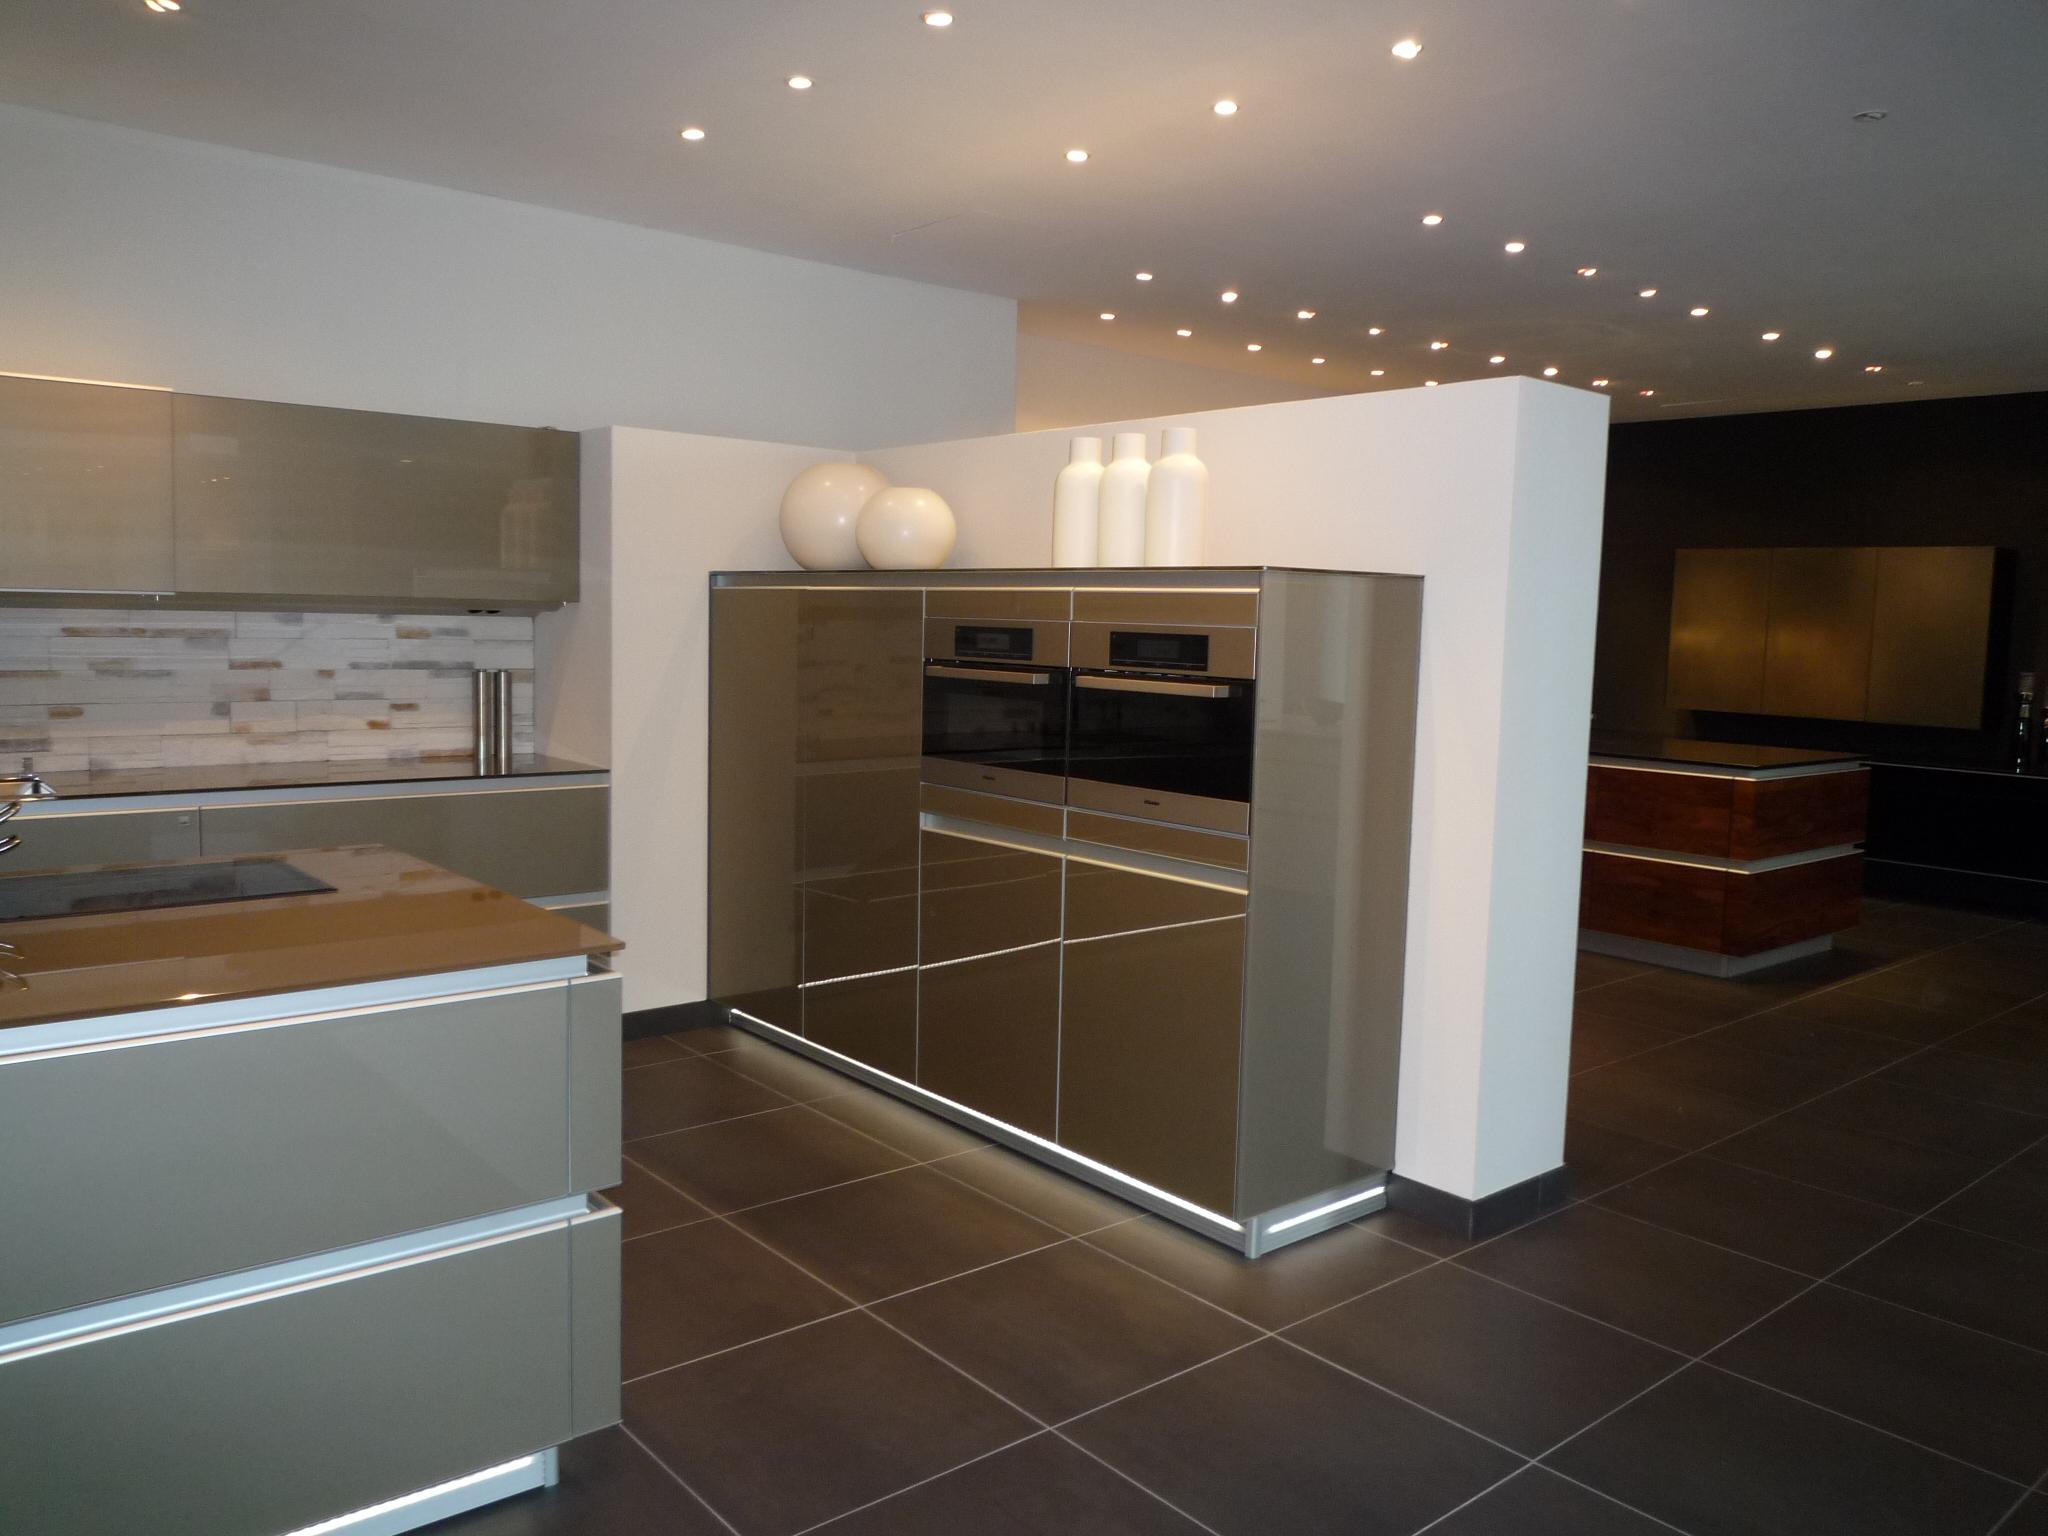 mein ausstellungsst ck zeyko horizon accento vitrin ingwermetallic. Black Bedroom Furniture Sets. Home Design Ideas